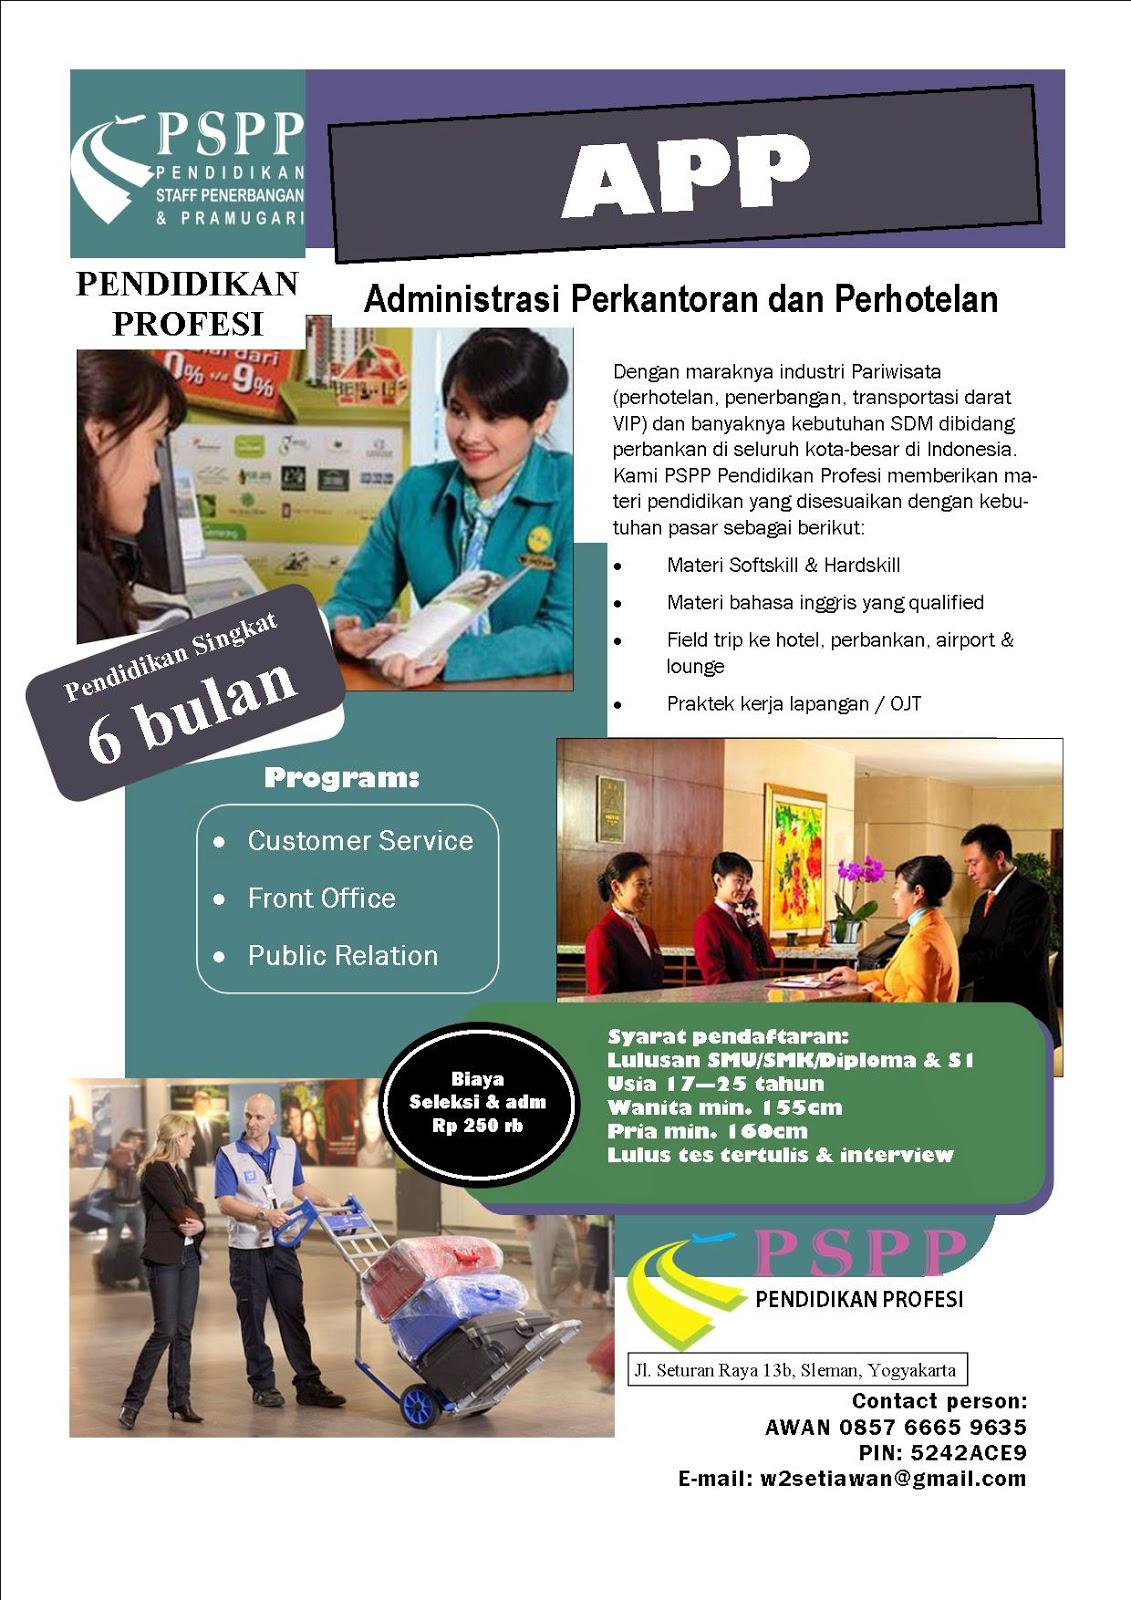 PSPP APP